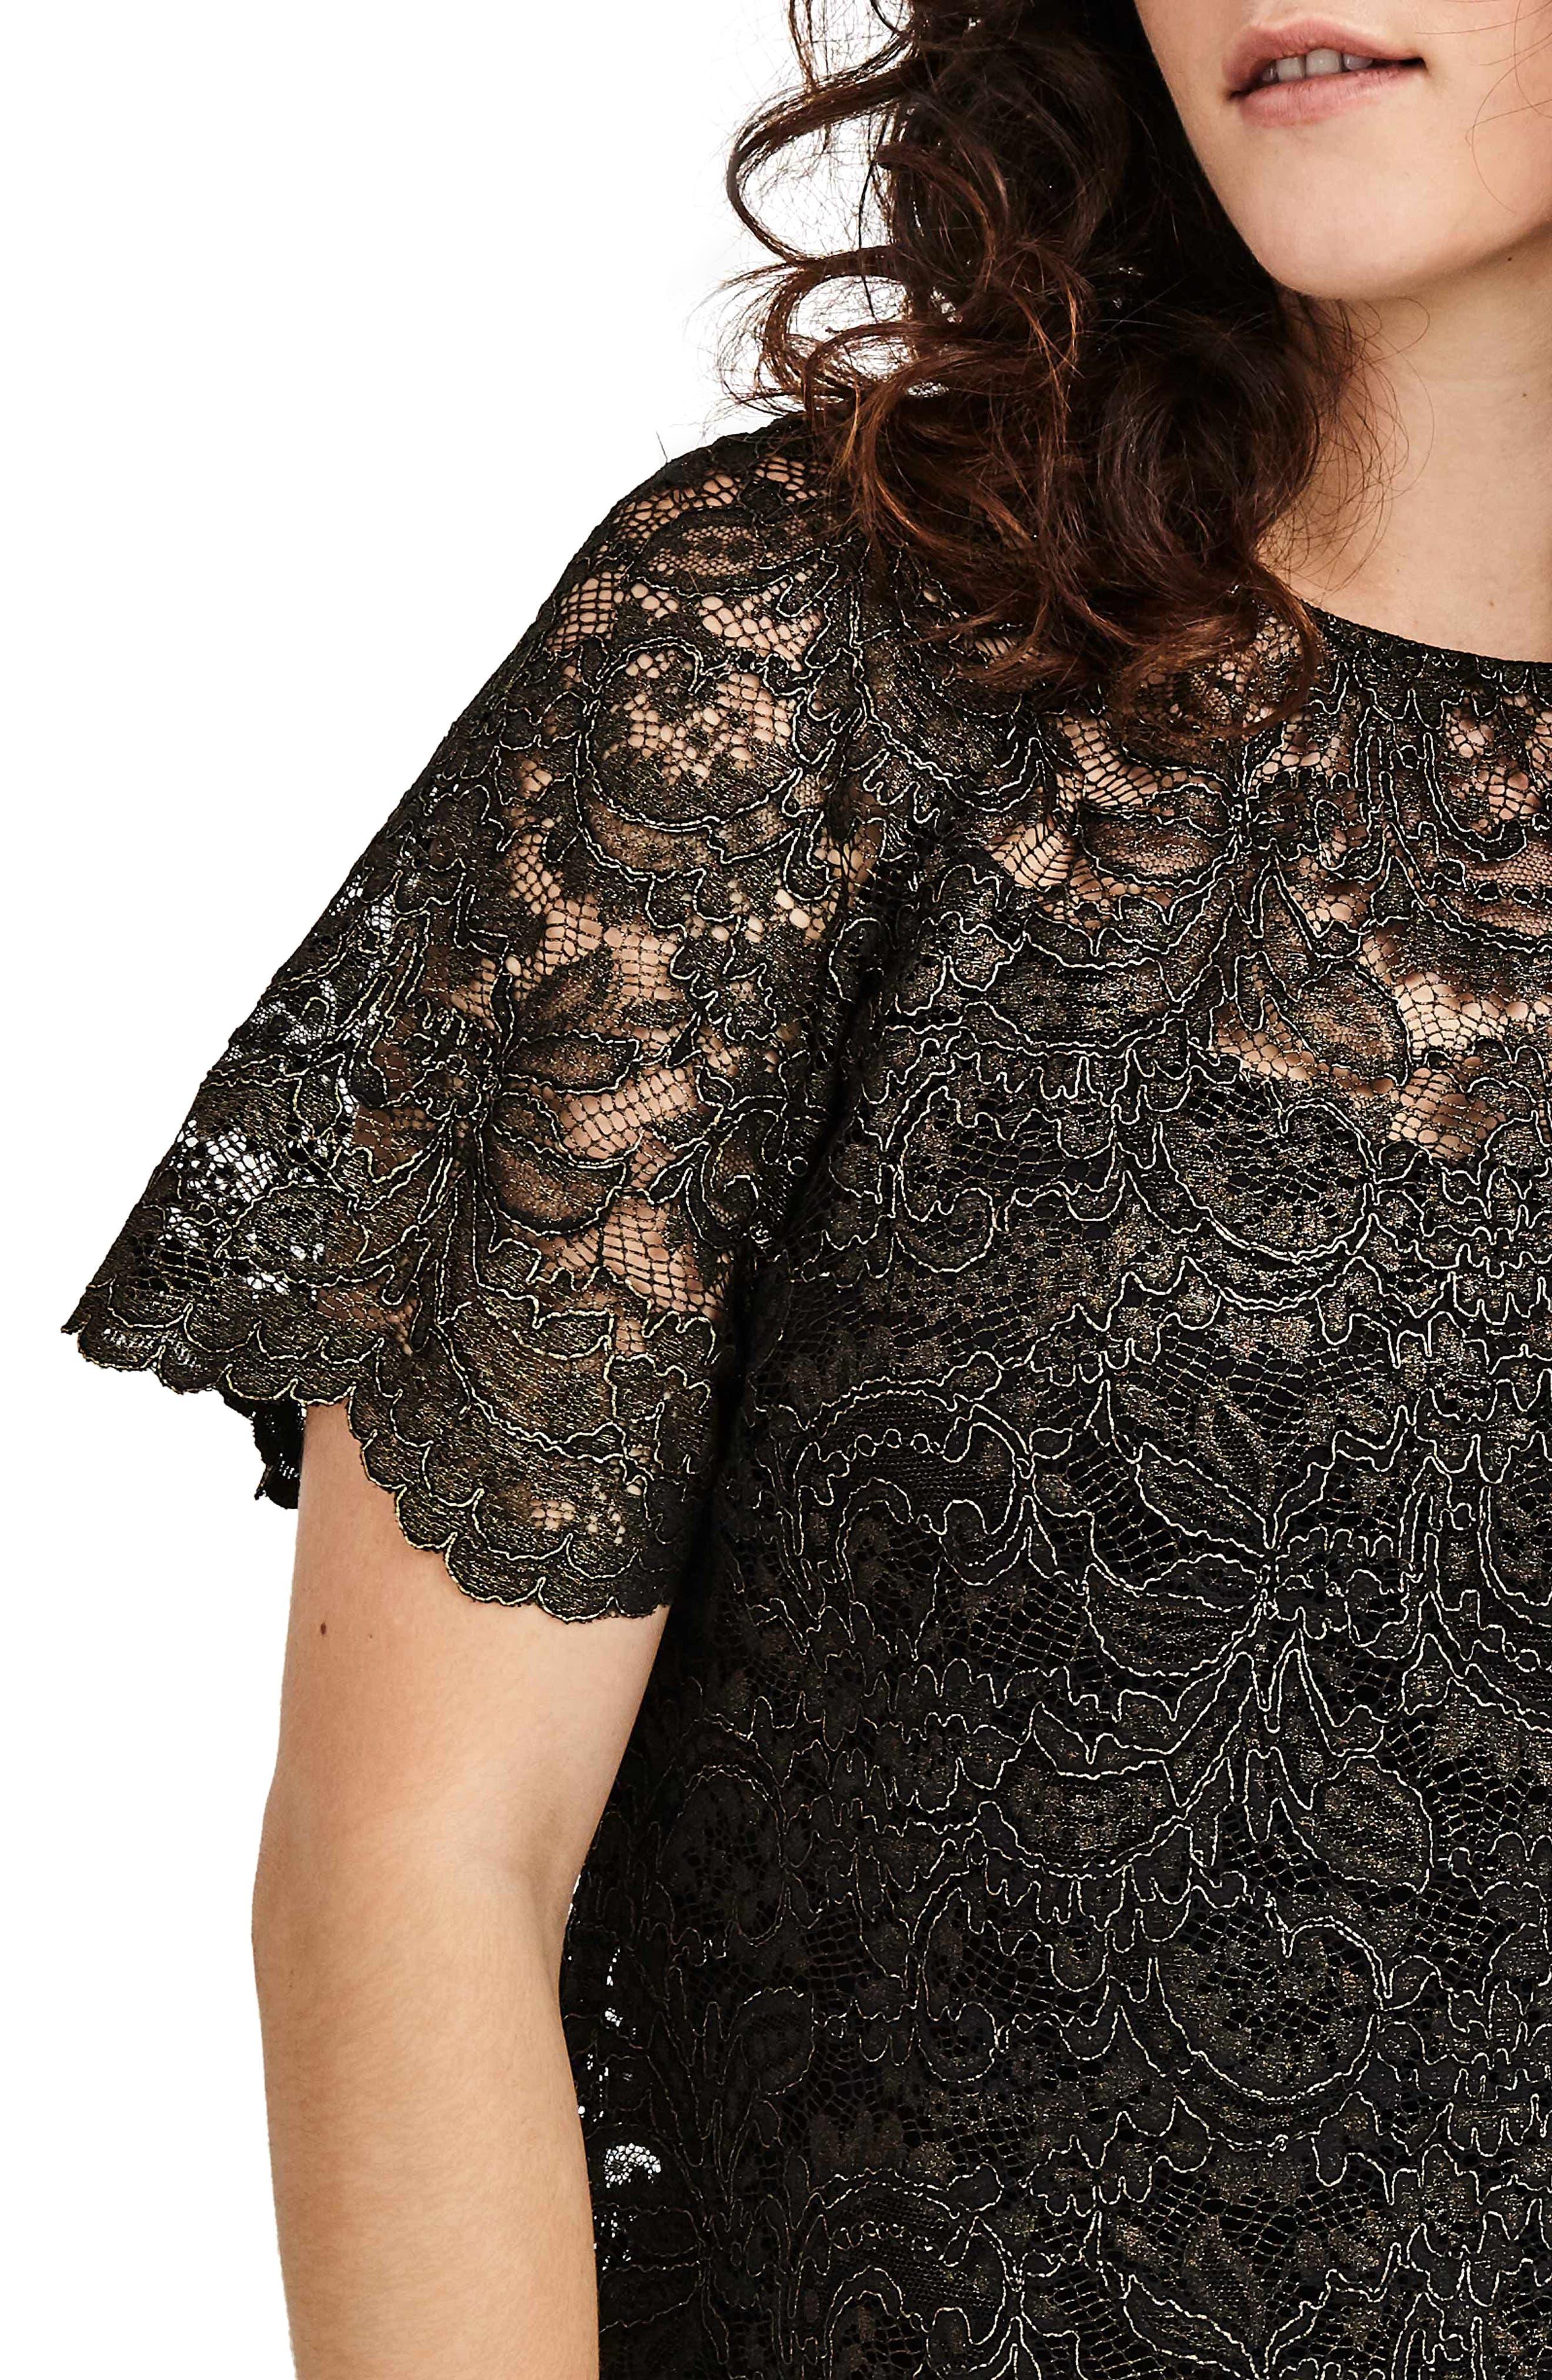 V-Back Lace Top,                             Alternate thumbnail 4, color,                             Black Gold